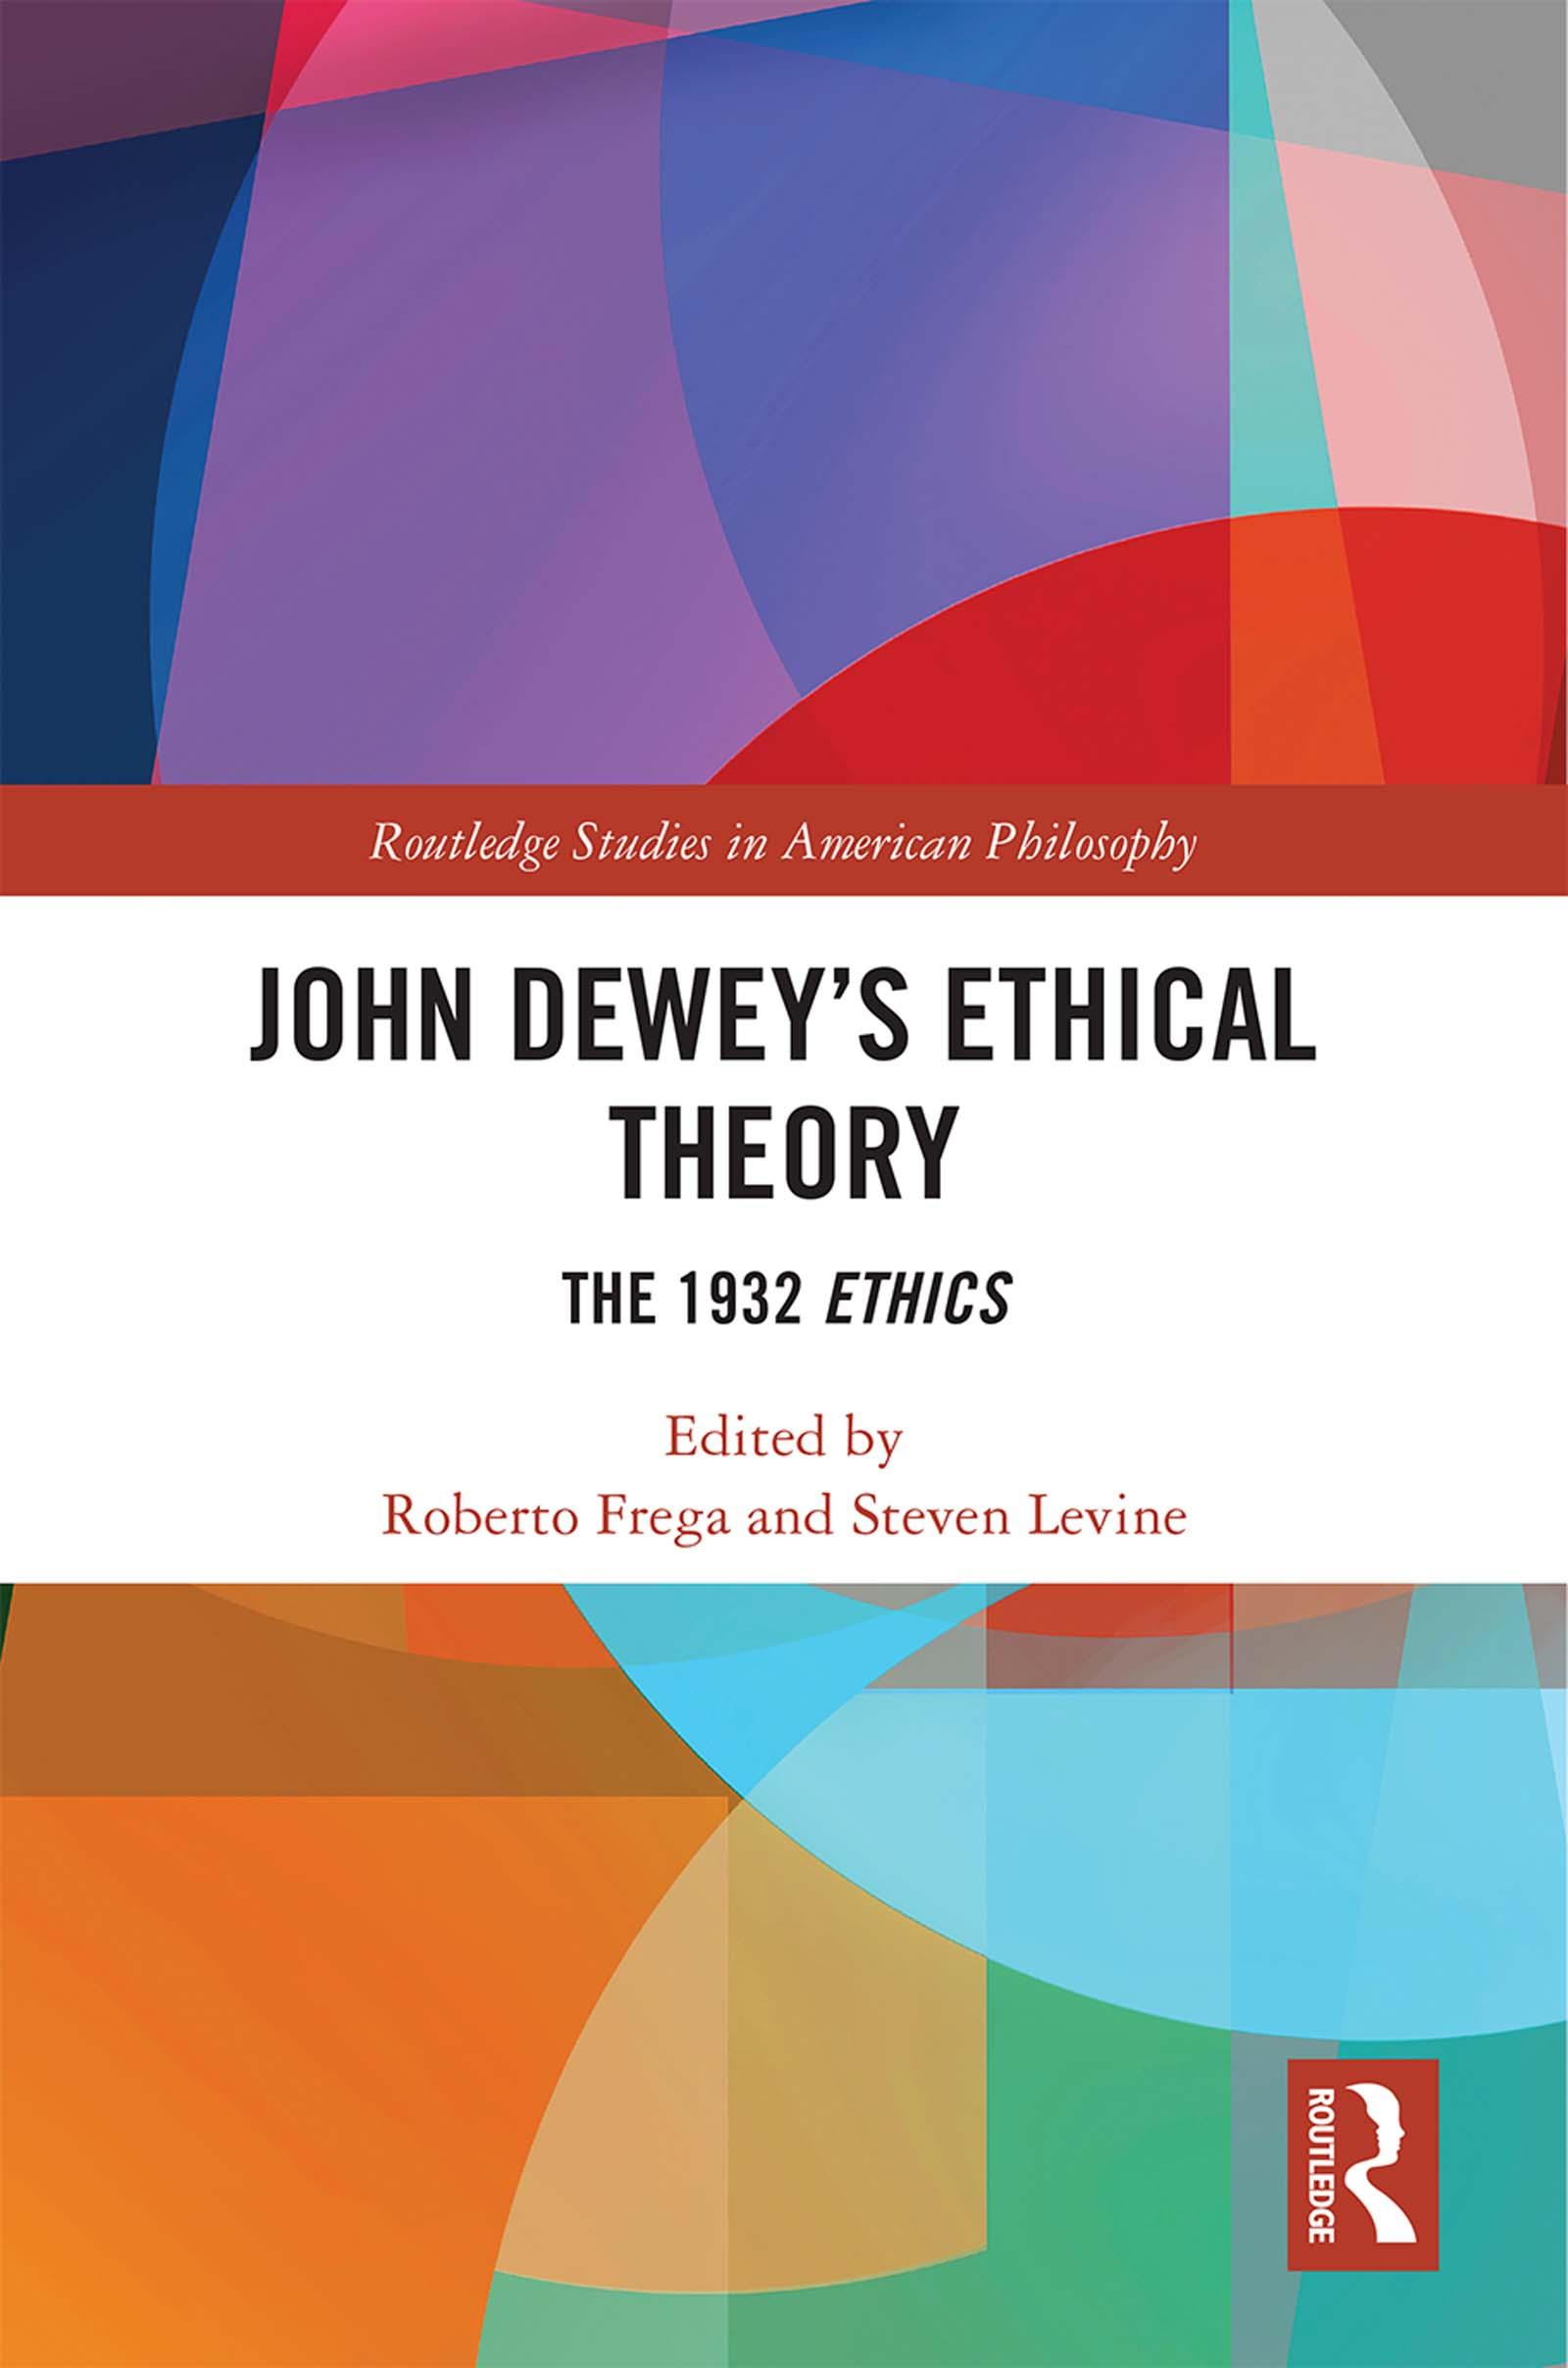 John Dewey's Ethical Theory